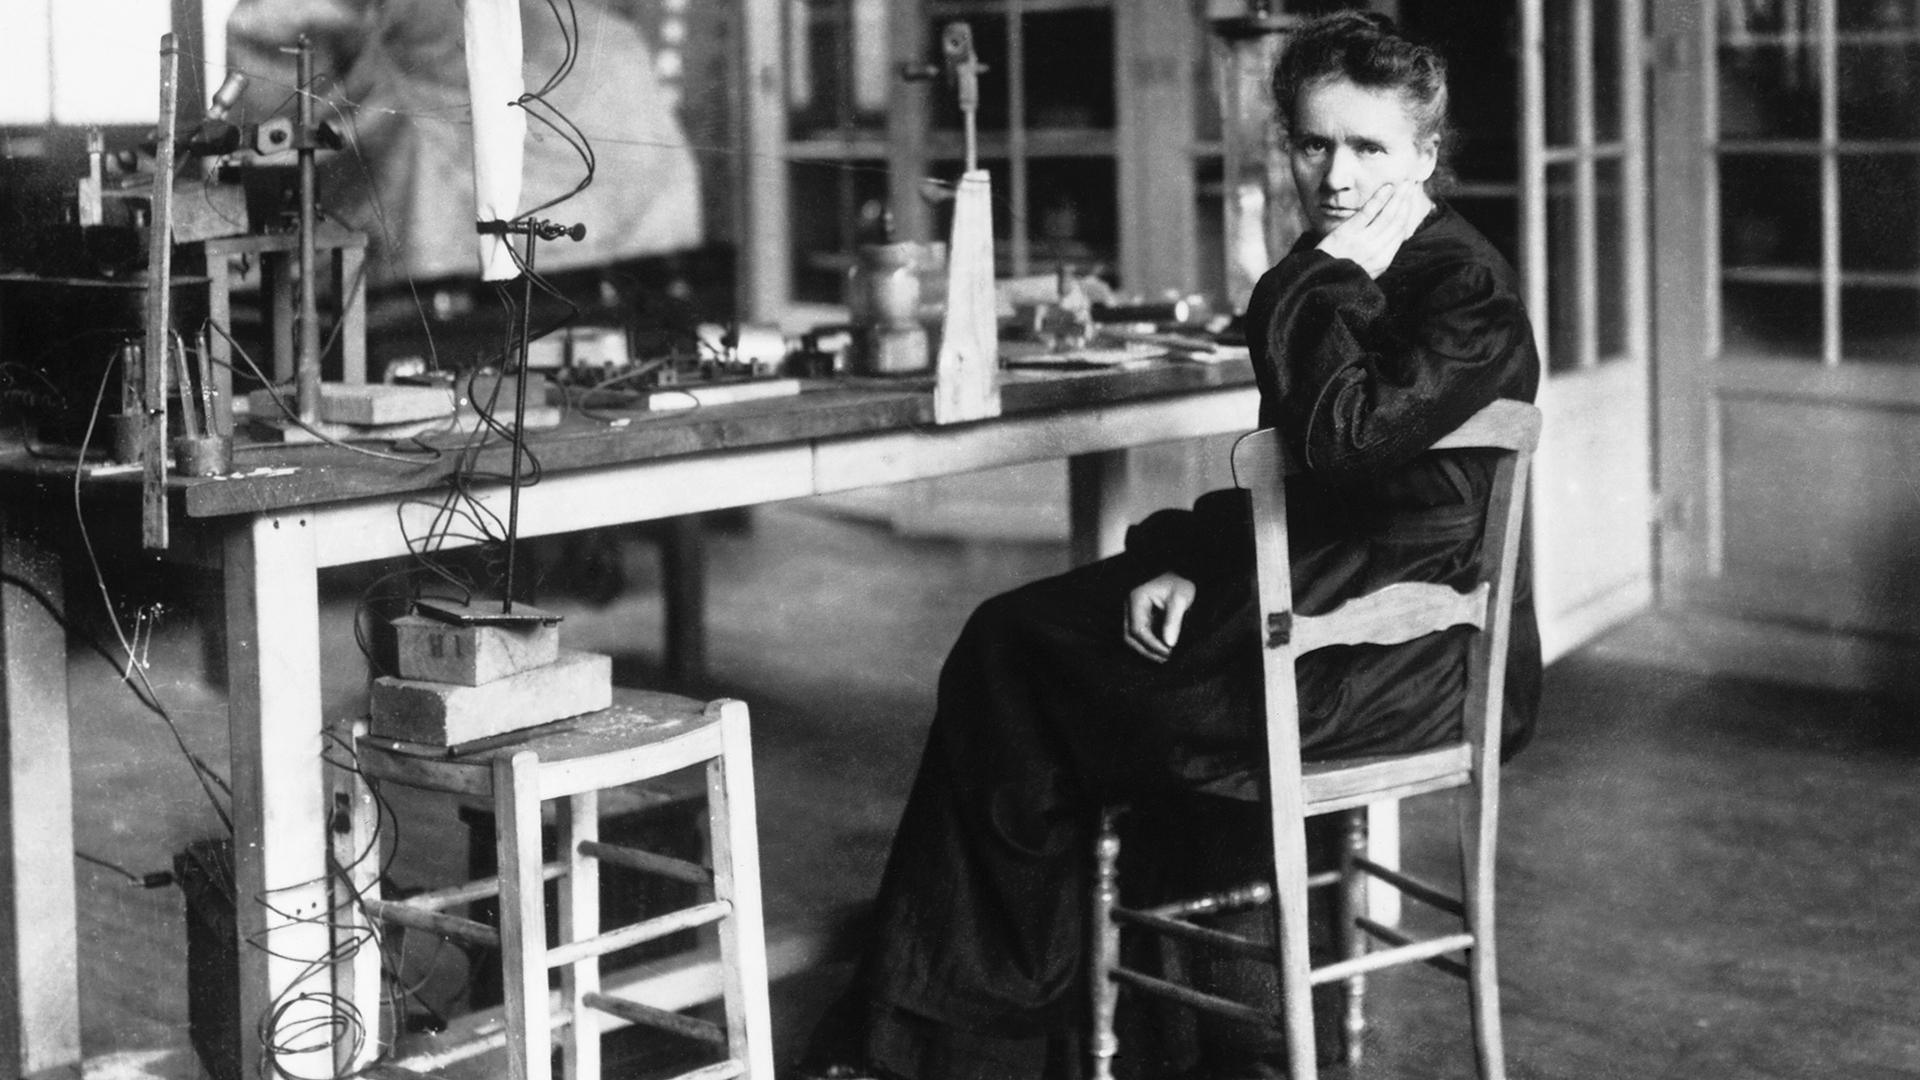 153 éve született Marie Curie